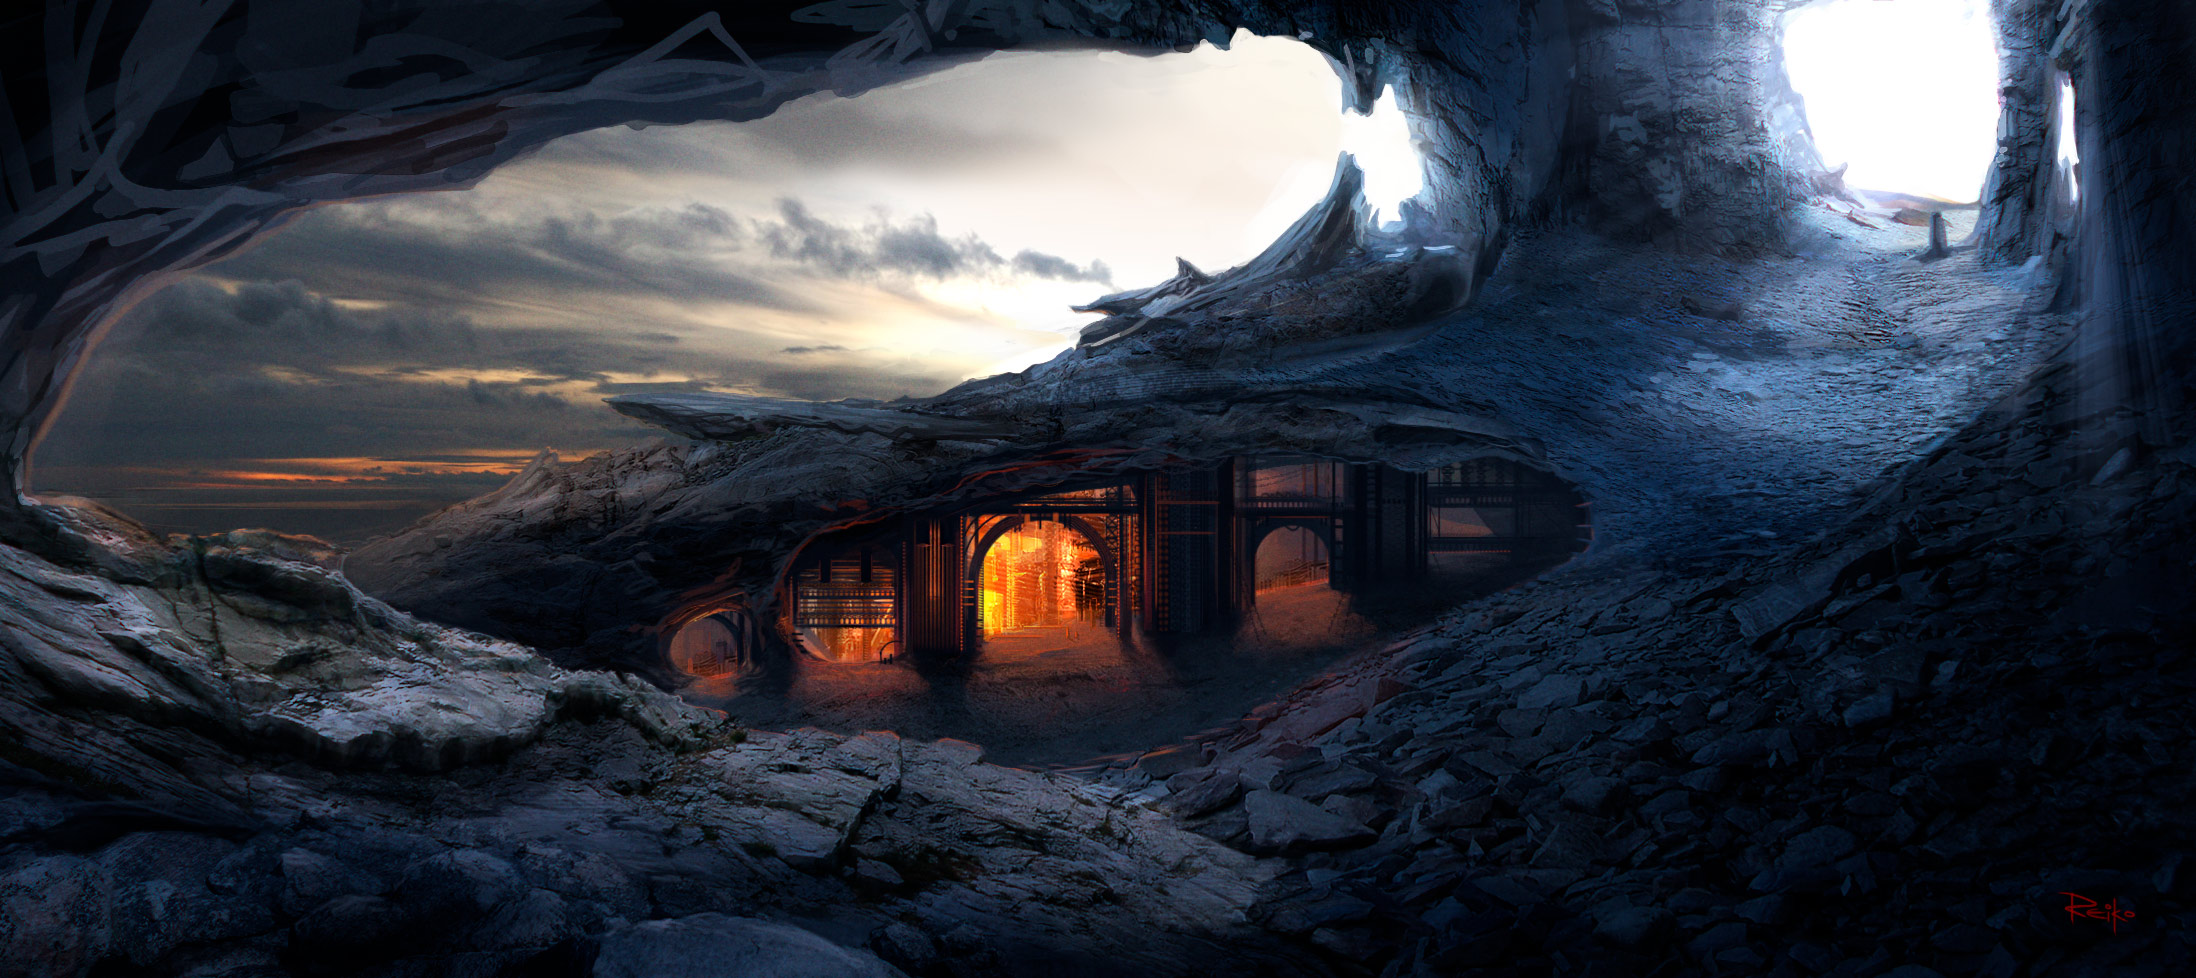 Présentation : concept artist Reiko Klug